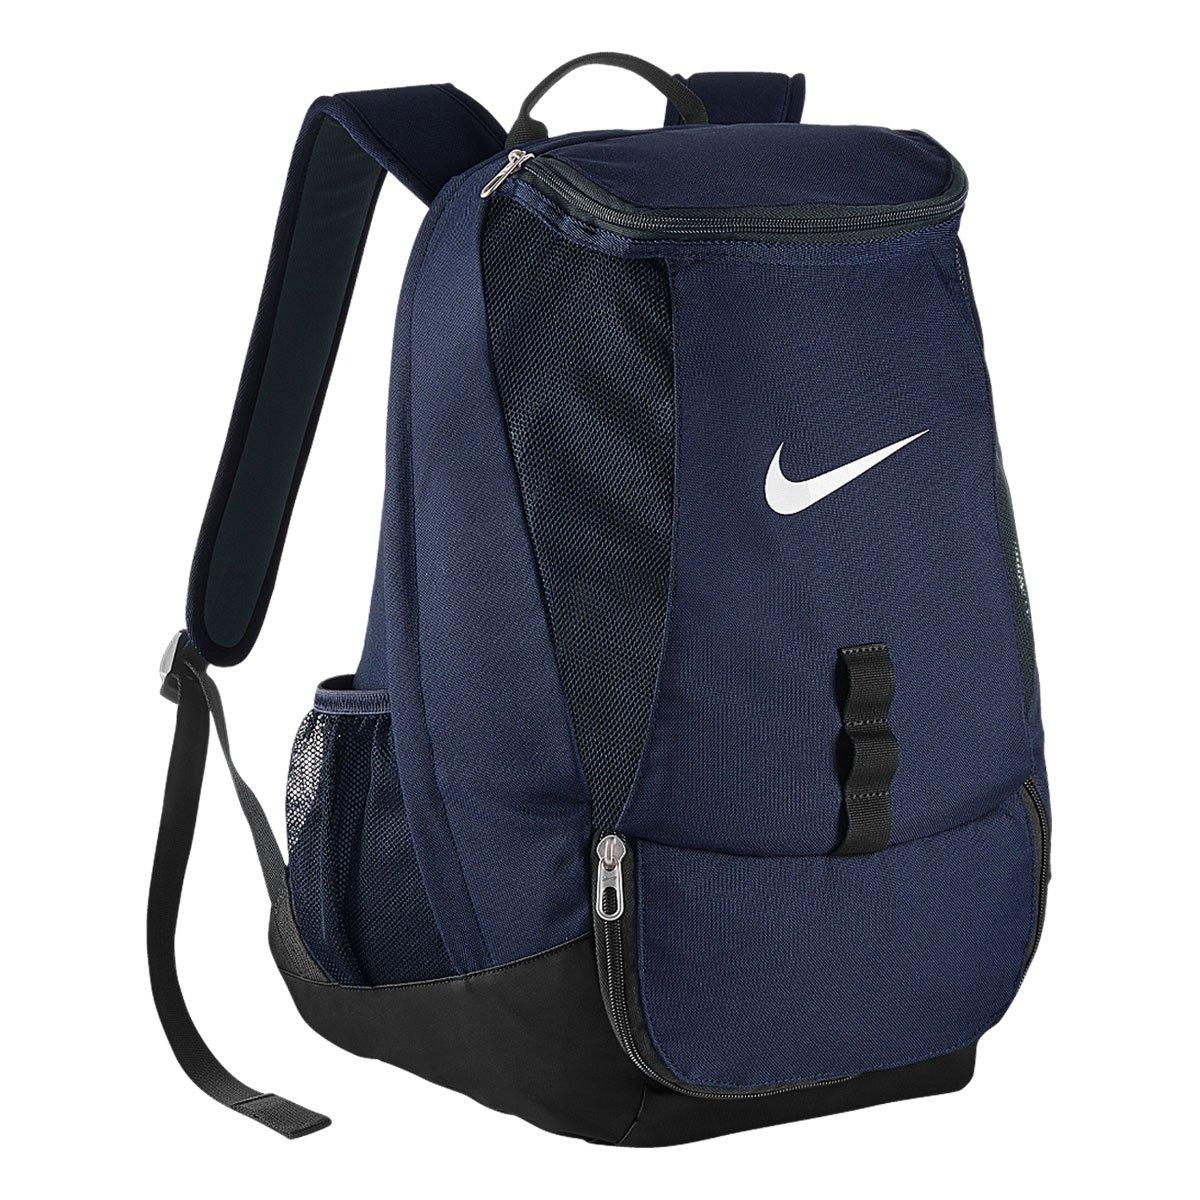 Agora Mochila Swoosh Team Club Netshoes Nike Compre AwCn4qXxaw